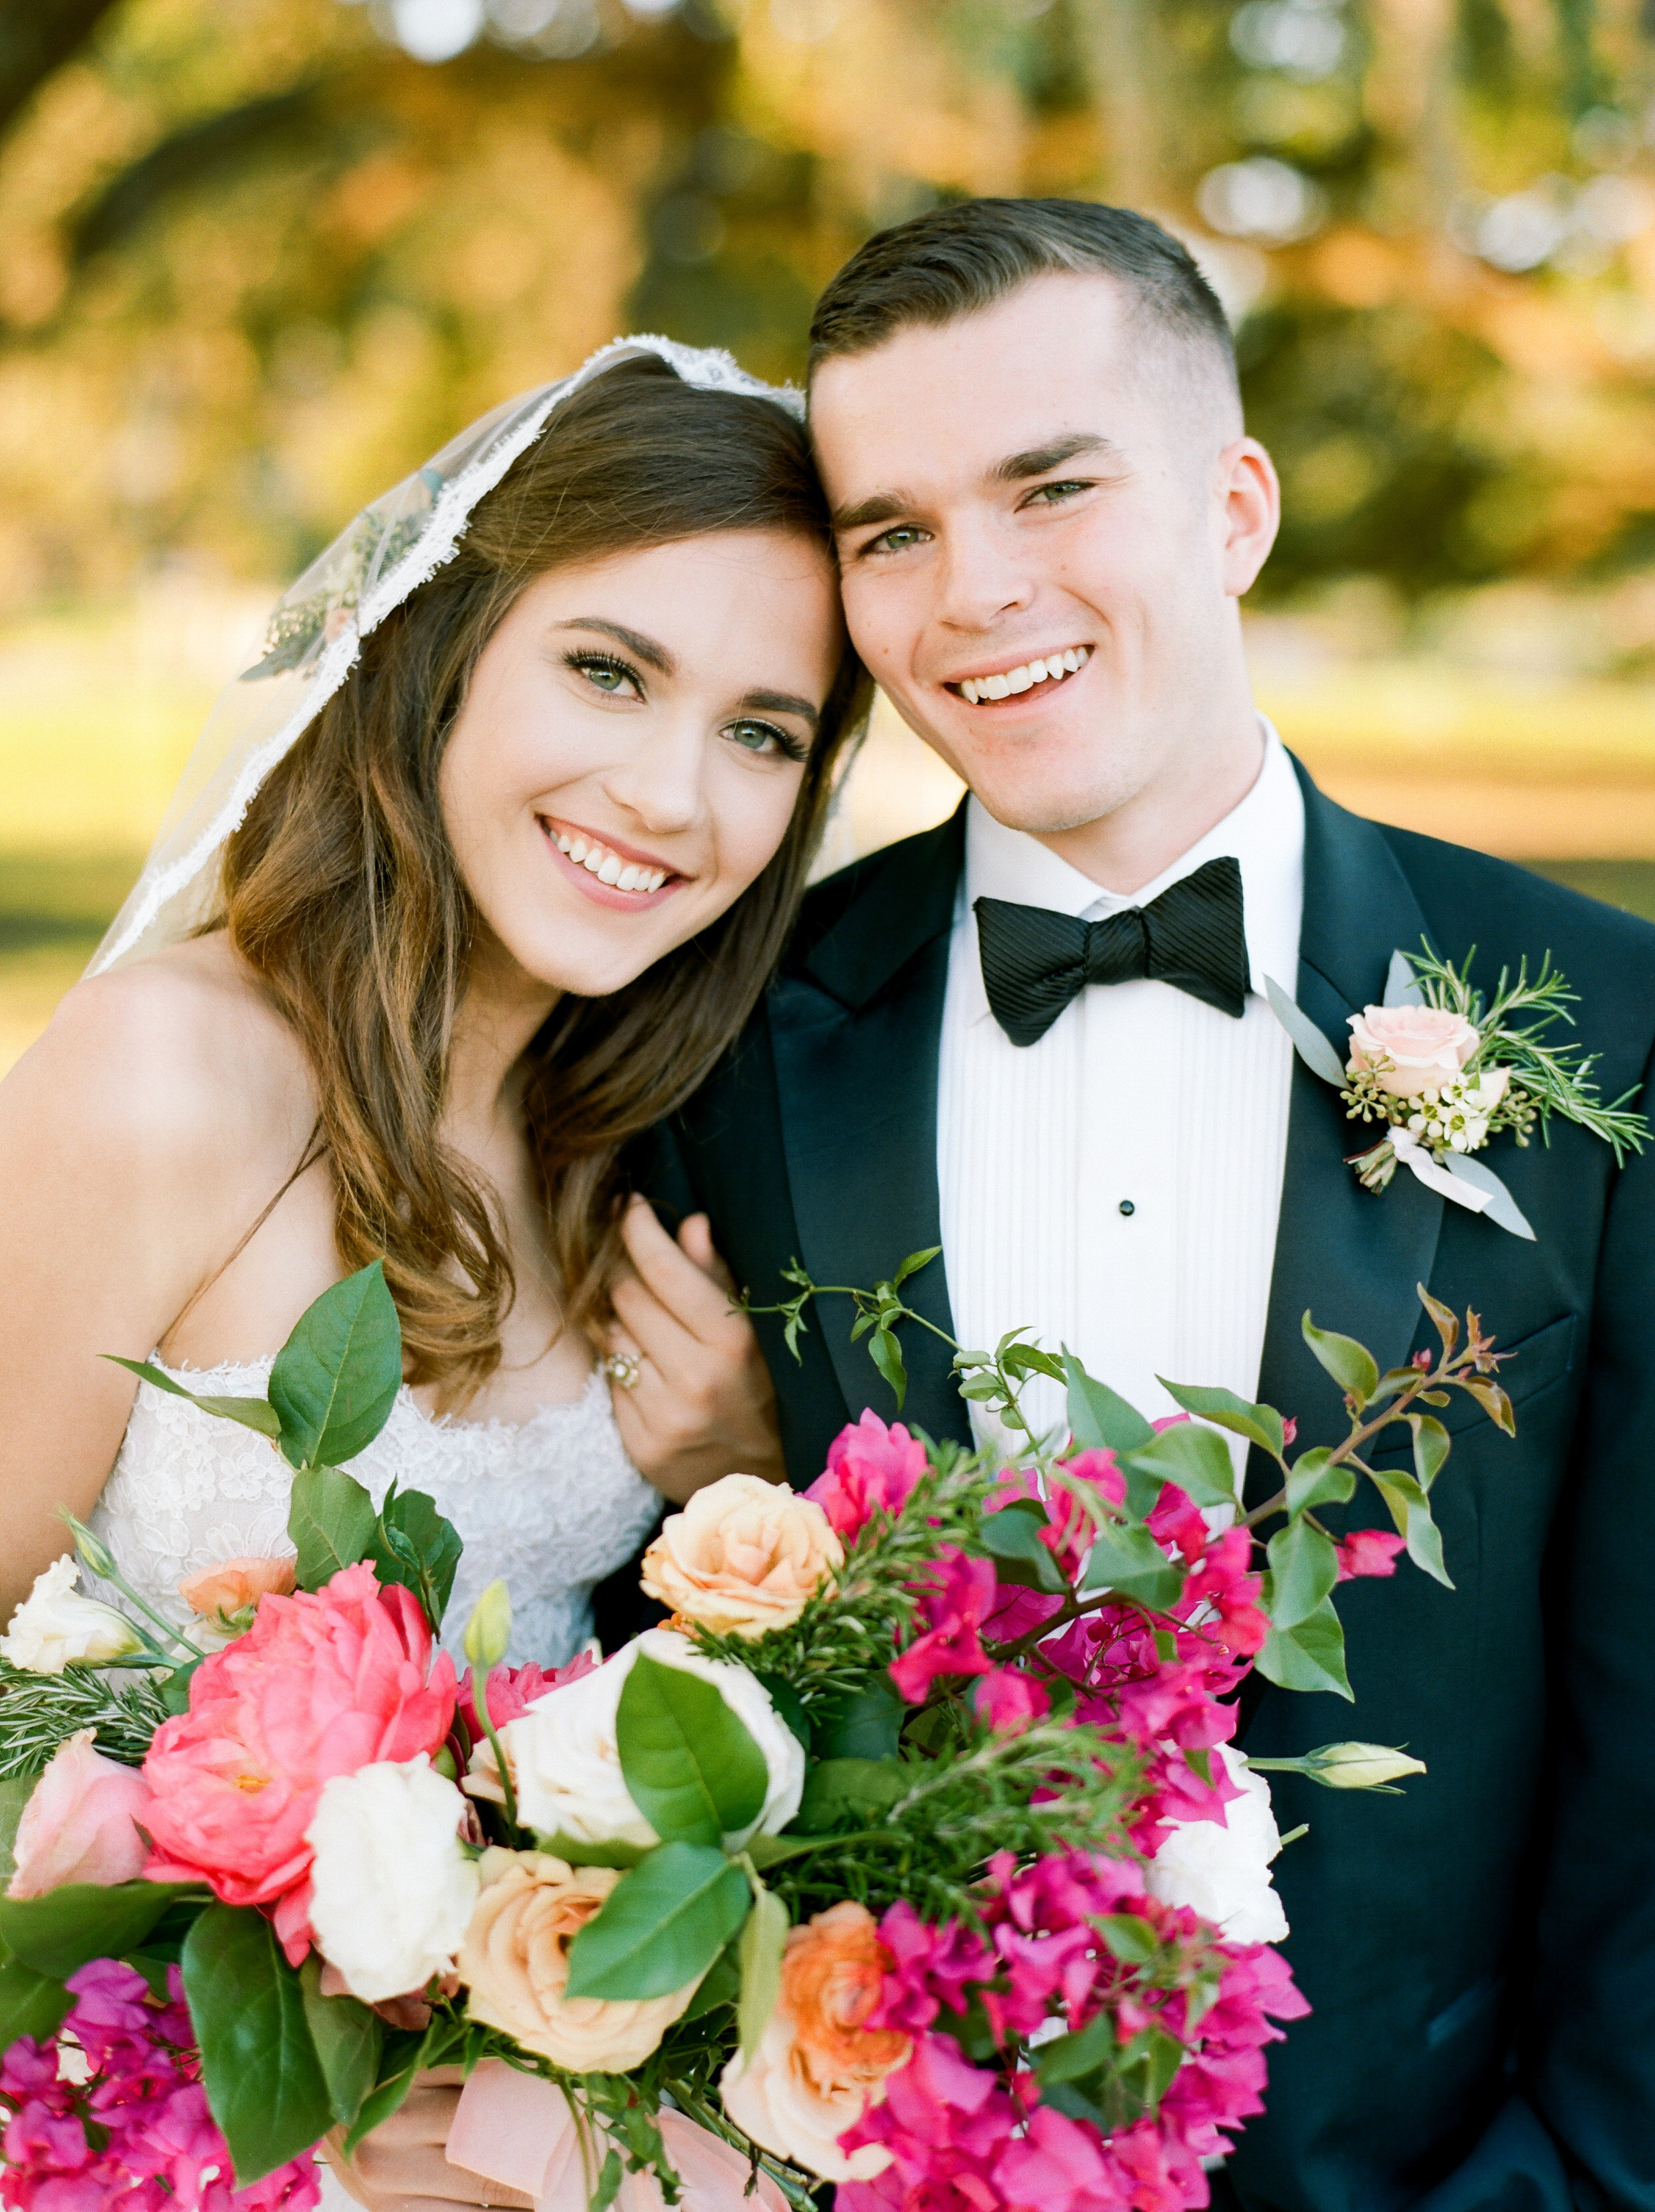 Top-Houston-Wedding-Photographer-Dana-Fernandez-Photography-The-Clubs-At-Houston-Oaks-Country-Club-Belle-Events-Film-Fine-Art-Destination-11.jpg